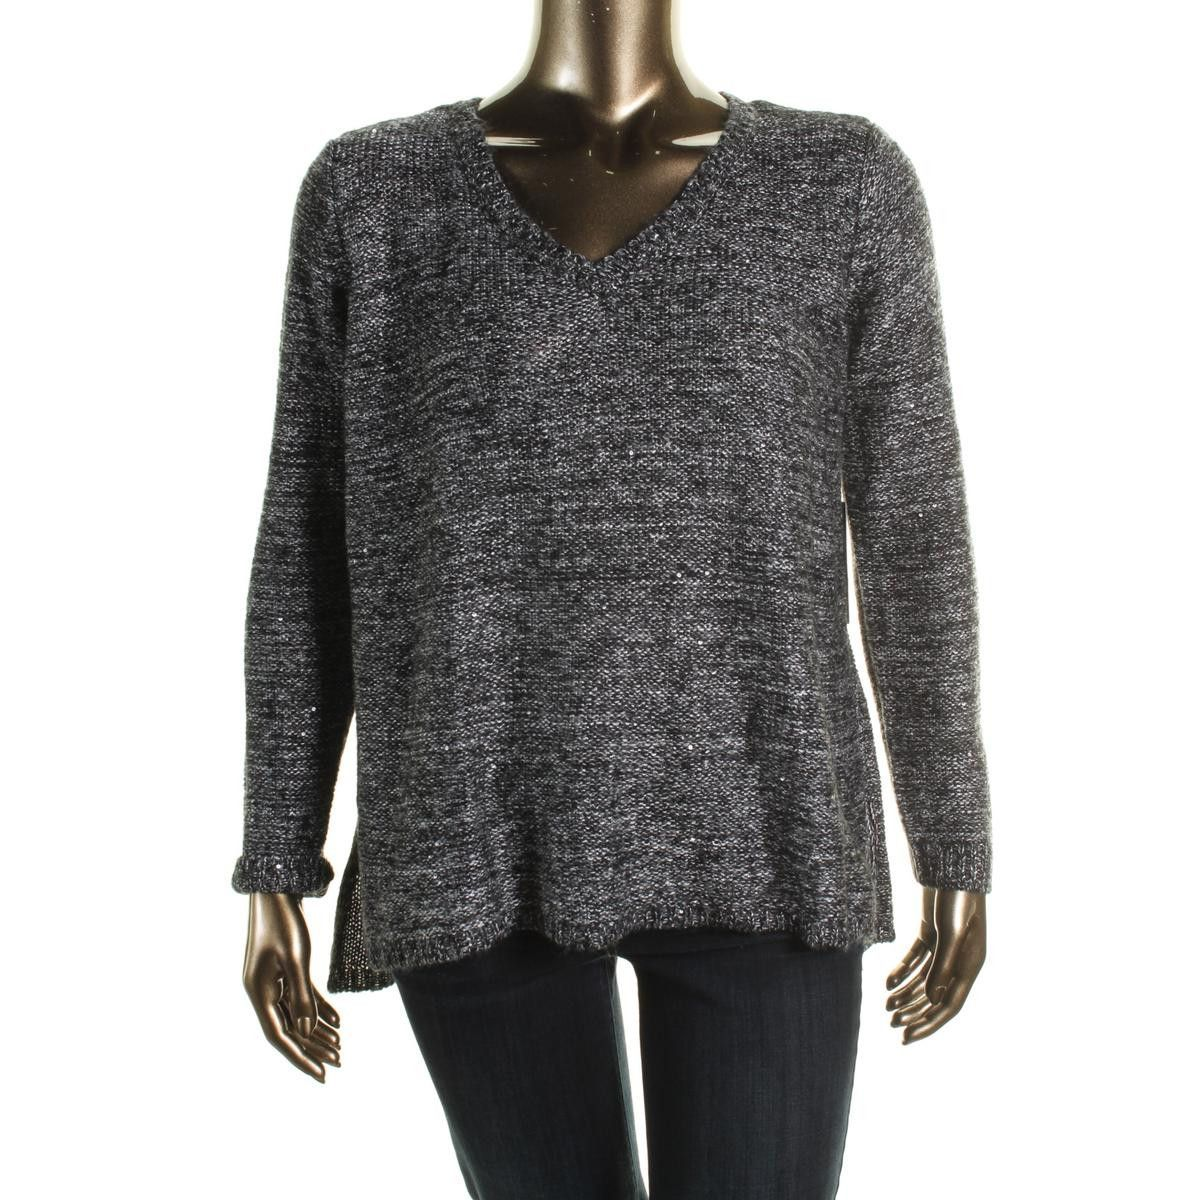 BB Dakota Womens Marled V-neck Tunic Sweater | Products ...